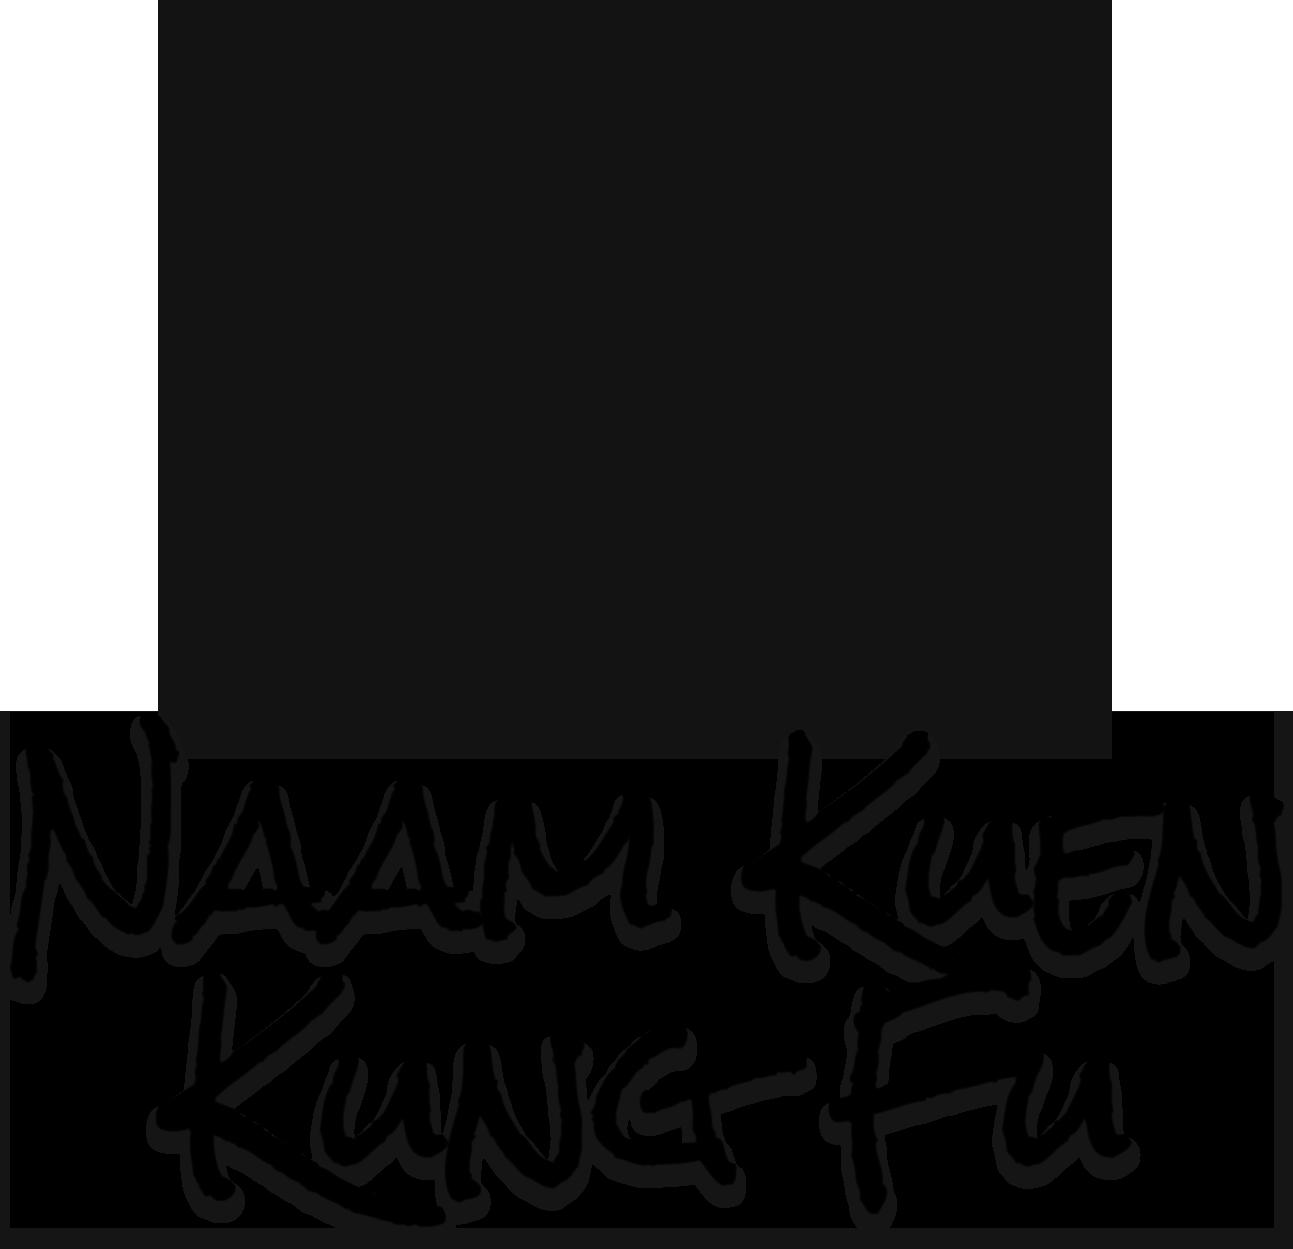 Naam Kuen Kung Fu